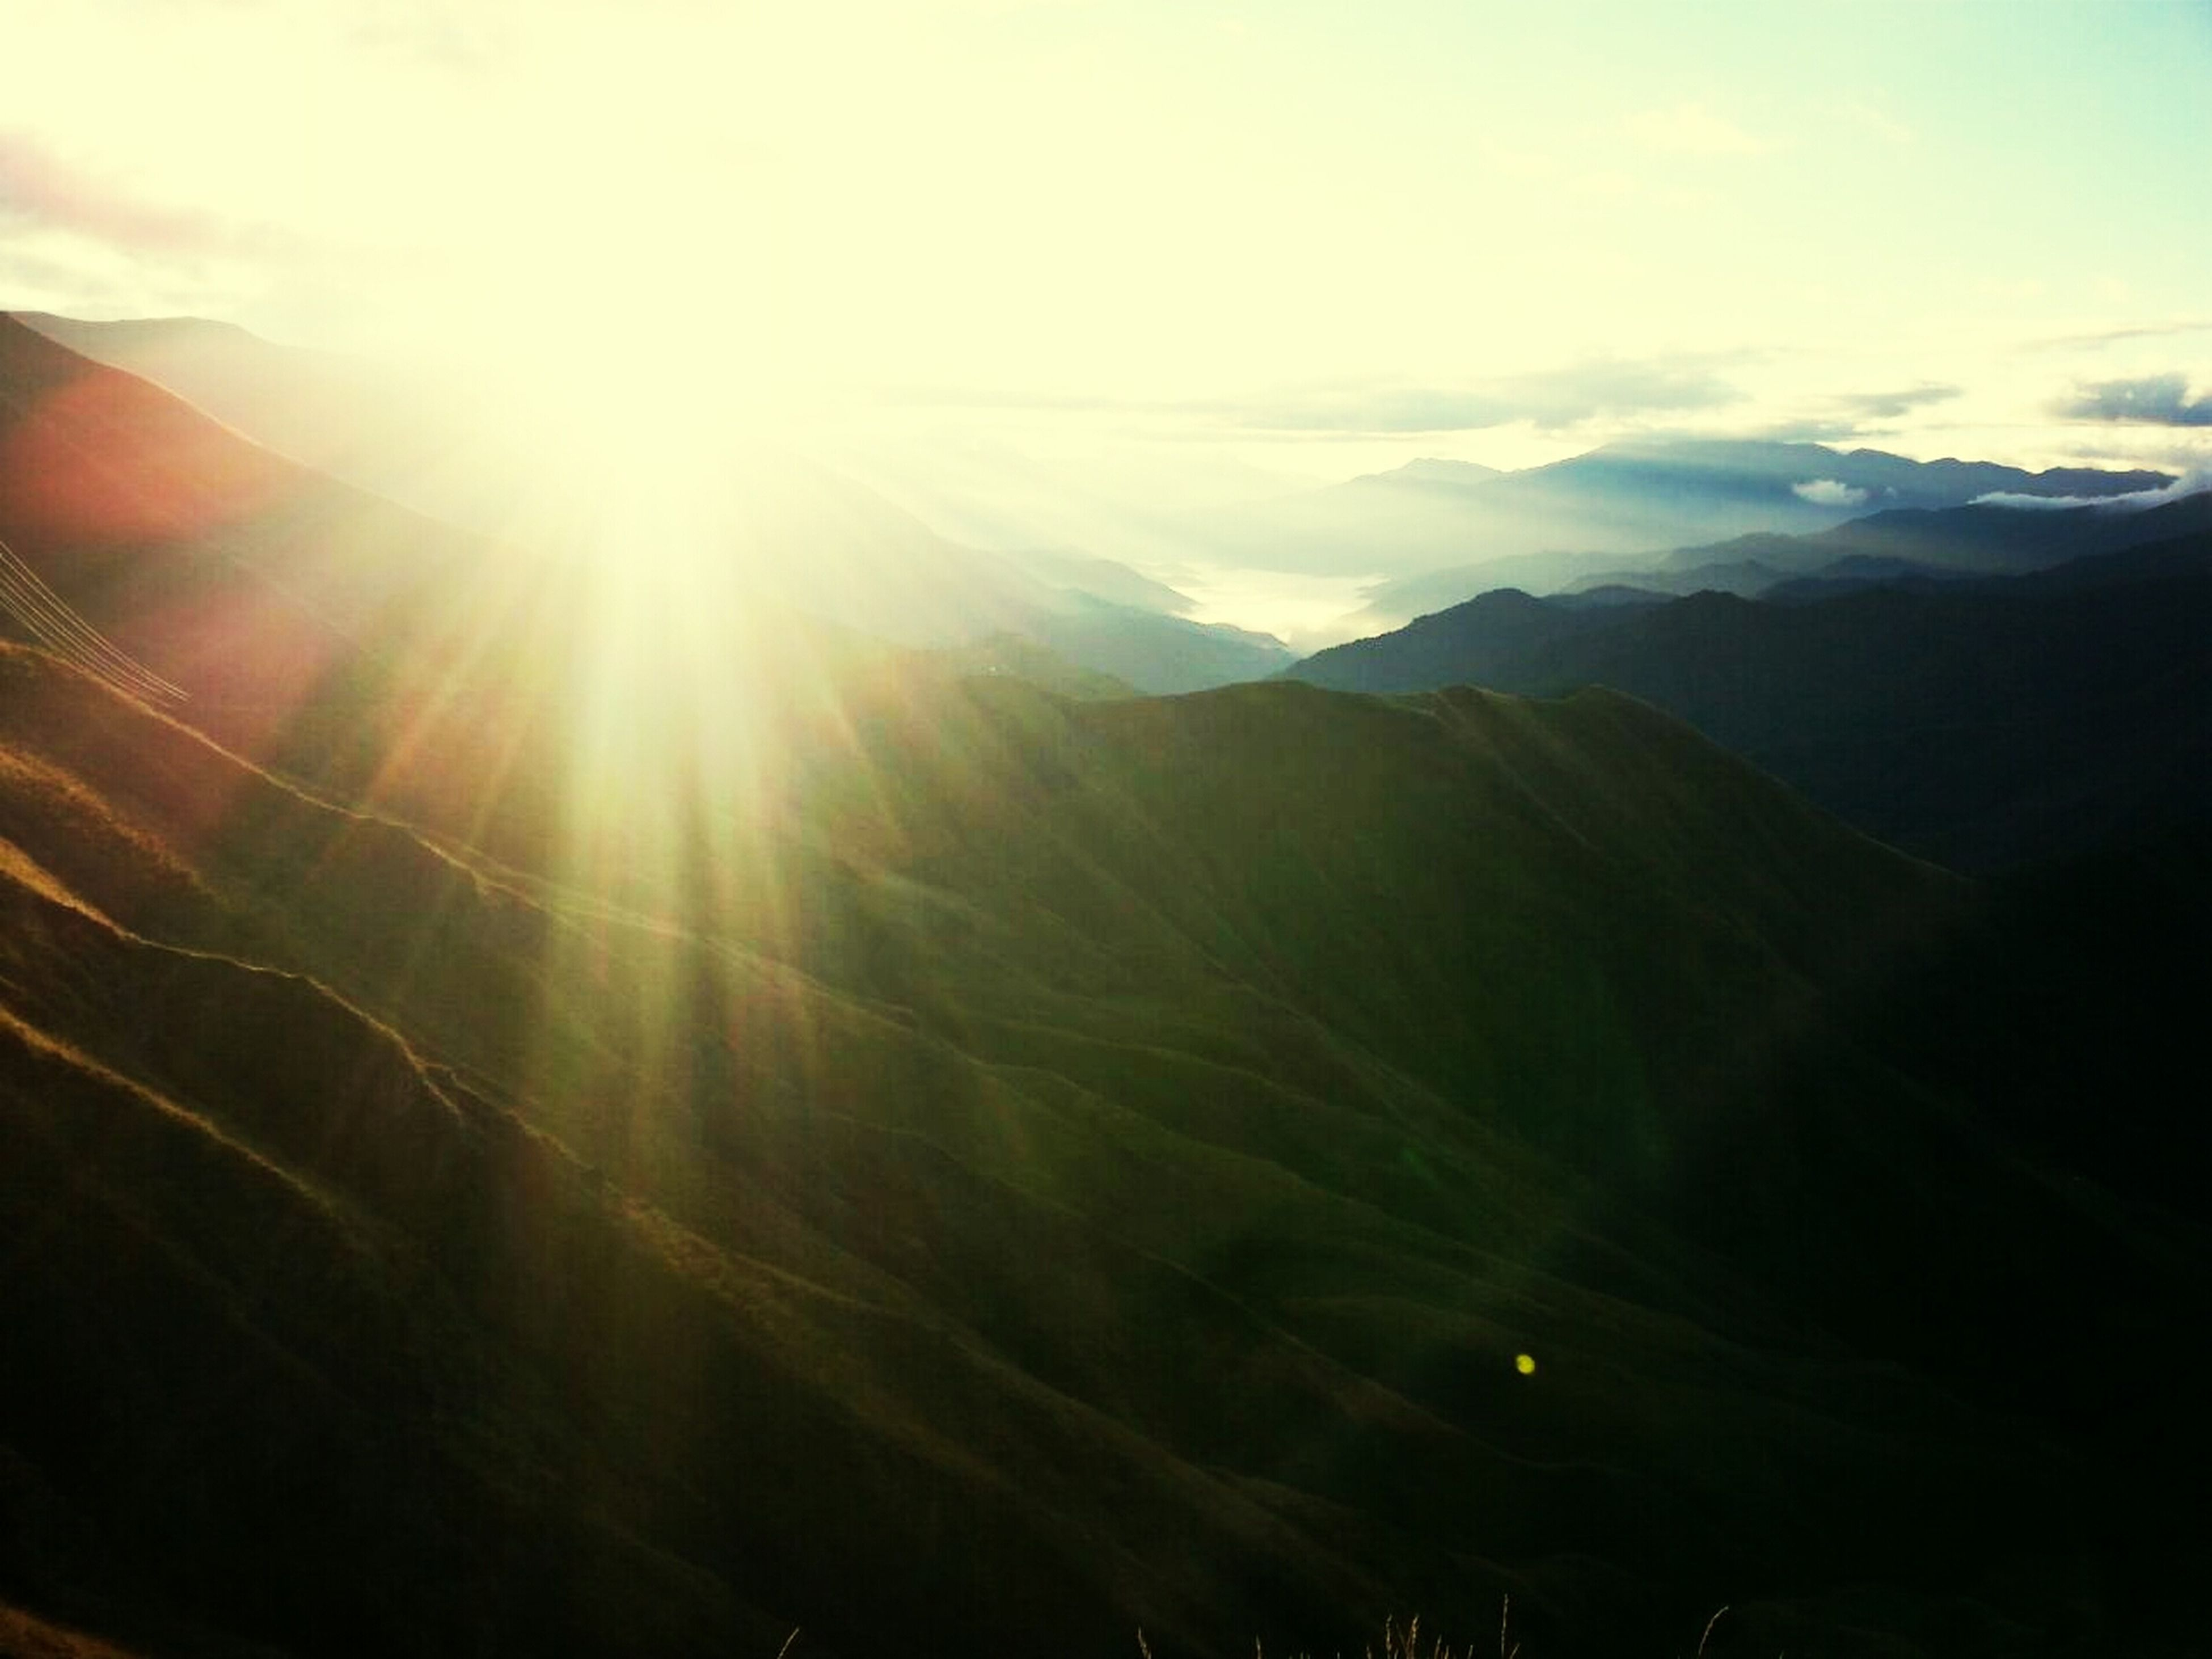 sun, mountain, sunbeam, lens flare, scenics, tranquil scene, tranquility, mountain range, beauty in nature, sunlight, sky, landscape, nature, idyllic, bright, cloud - sky, non-urban scene, sunny, cloud, outdoors